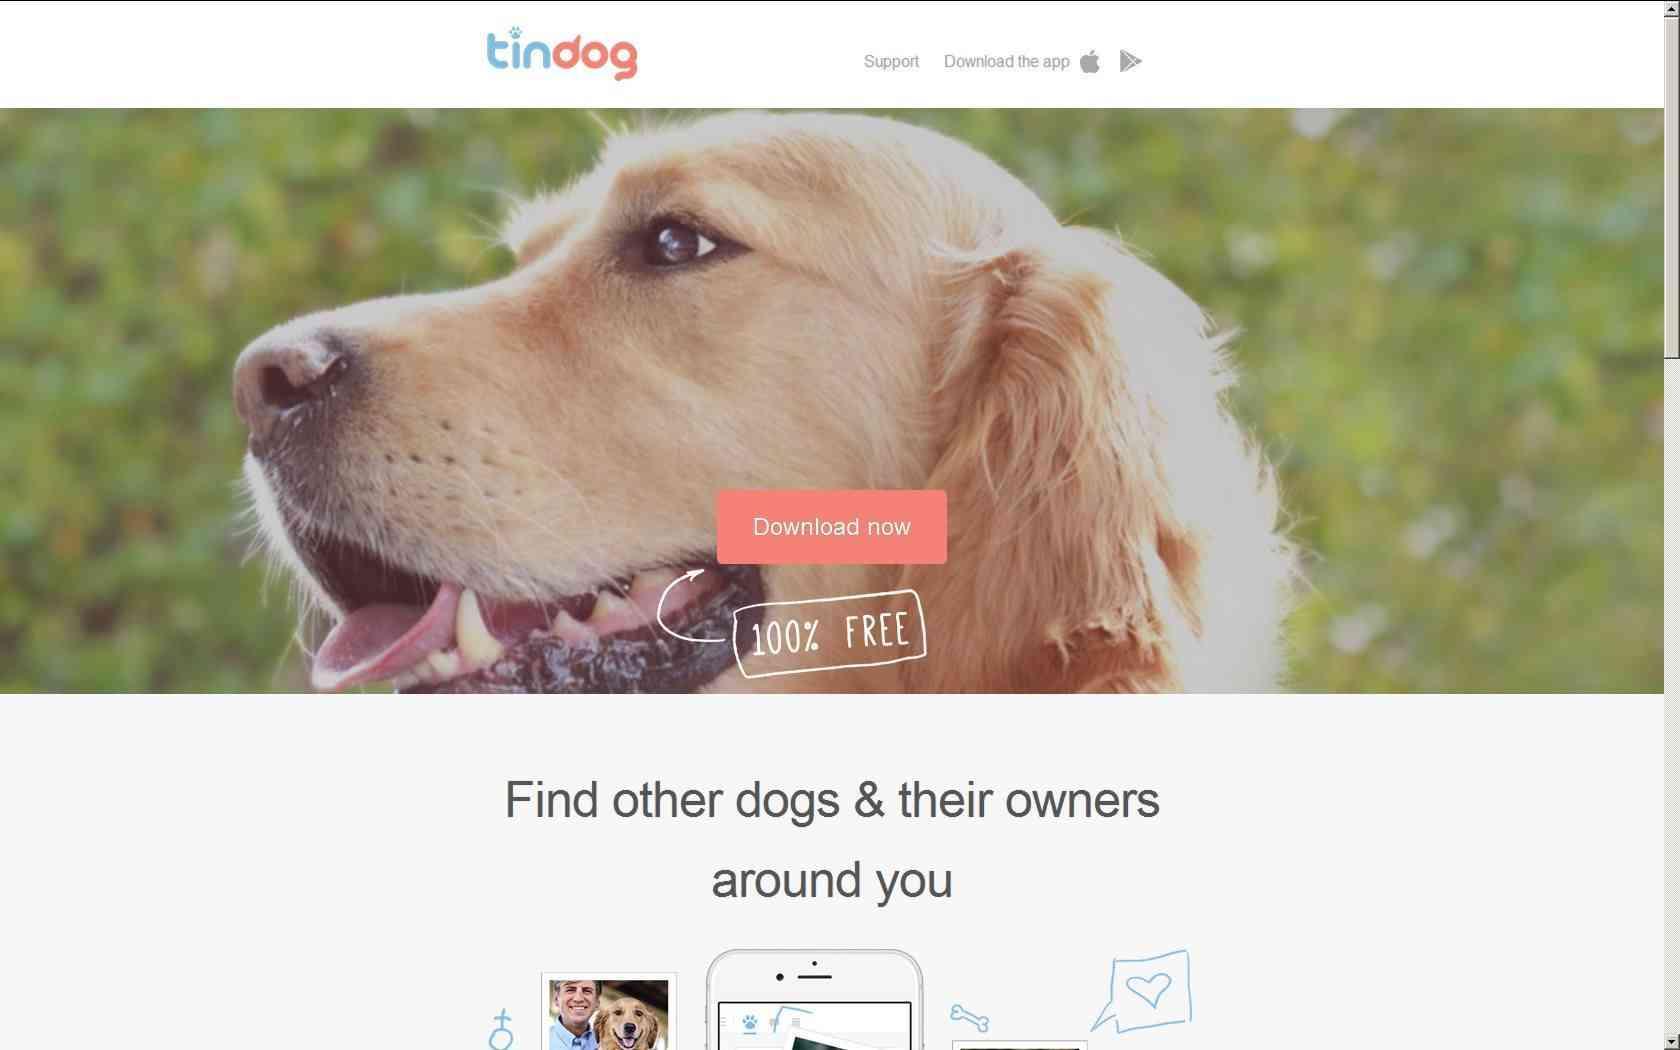 Aplicación de citas para perros 1